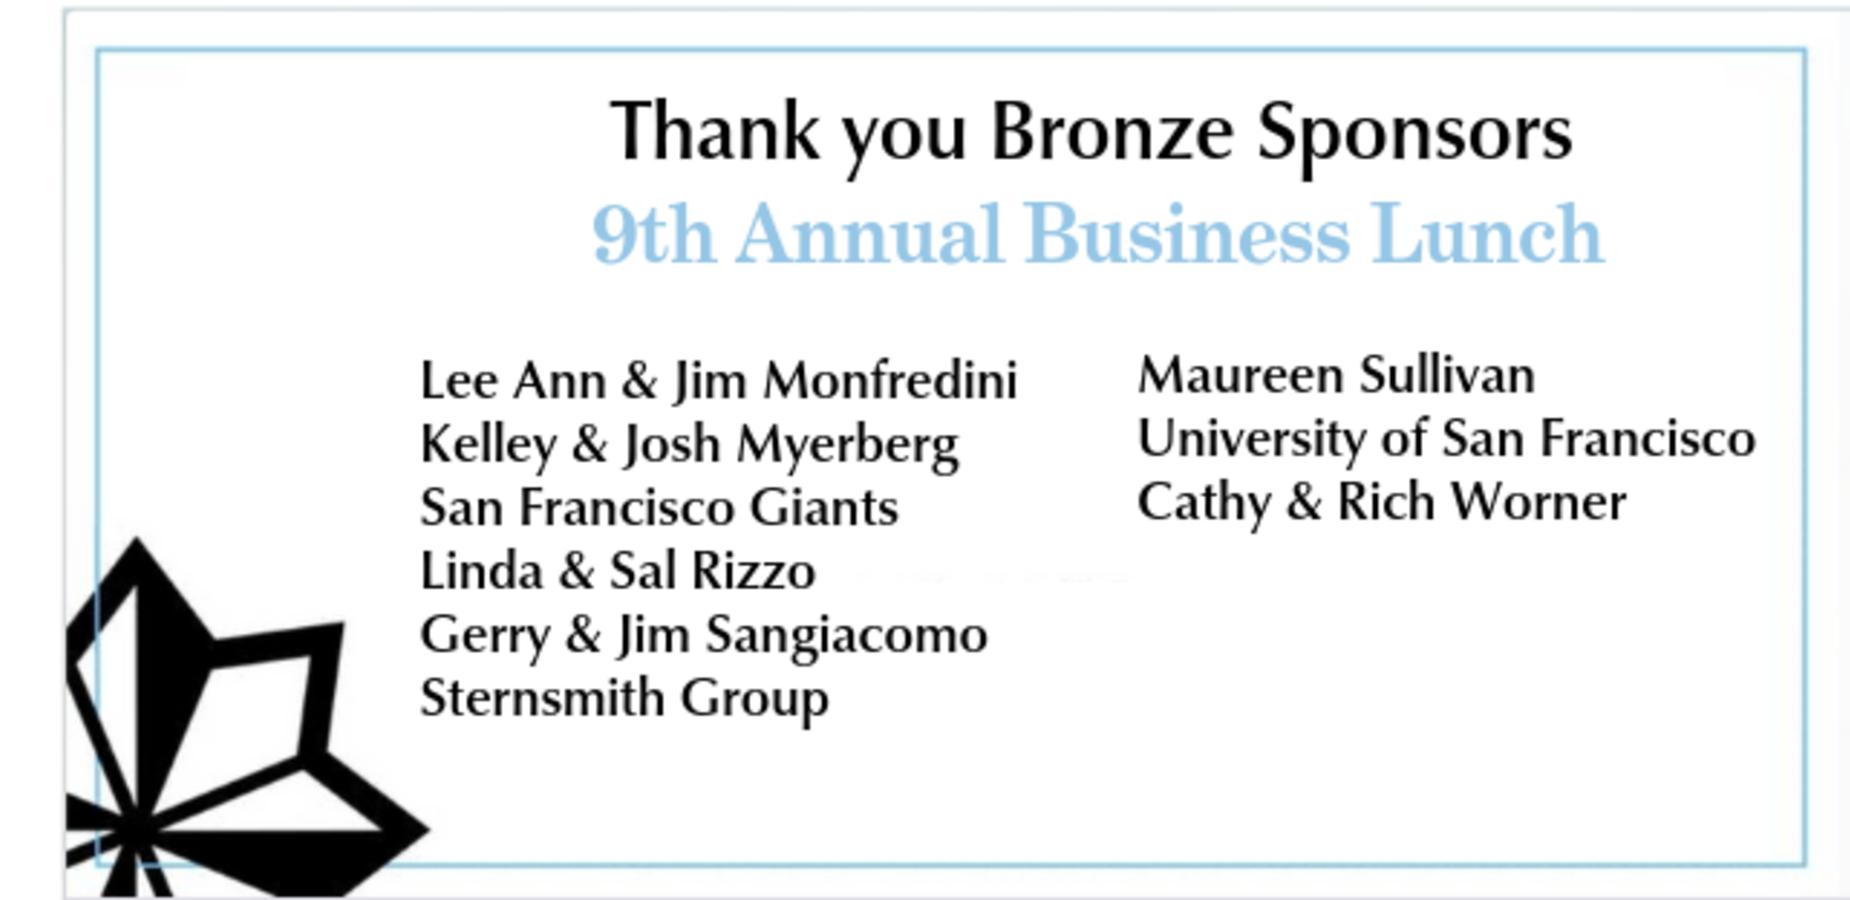 2nd list of Bronze sponsors